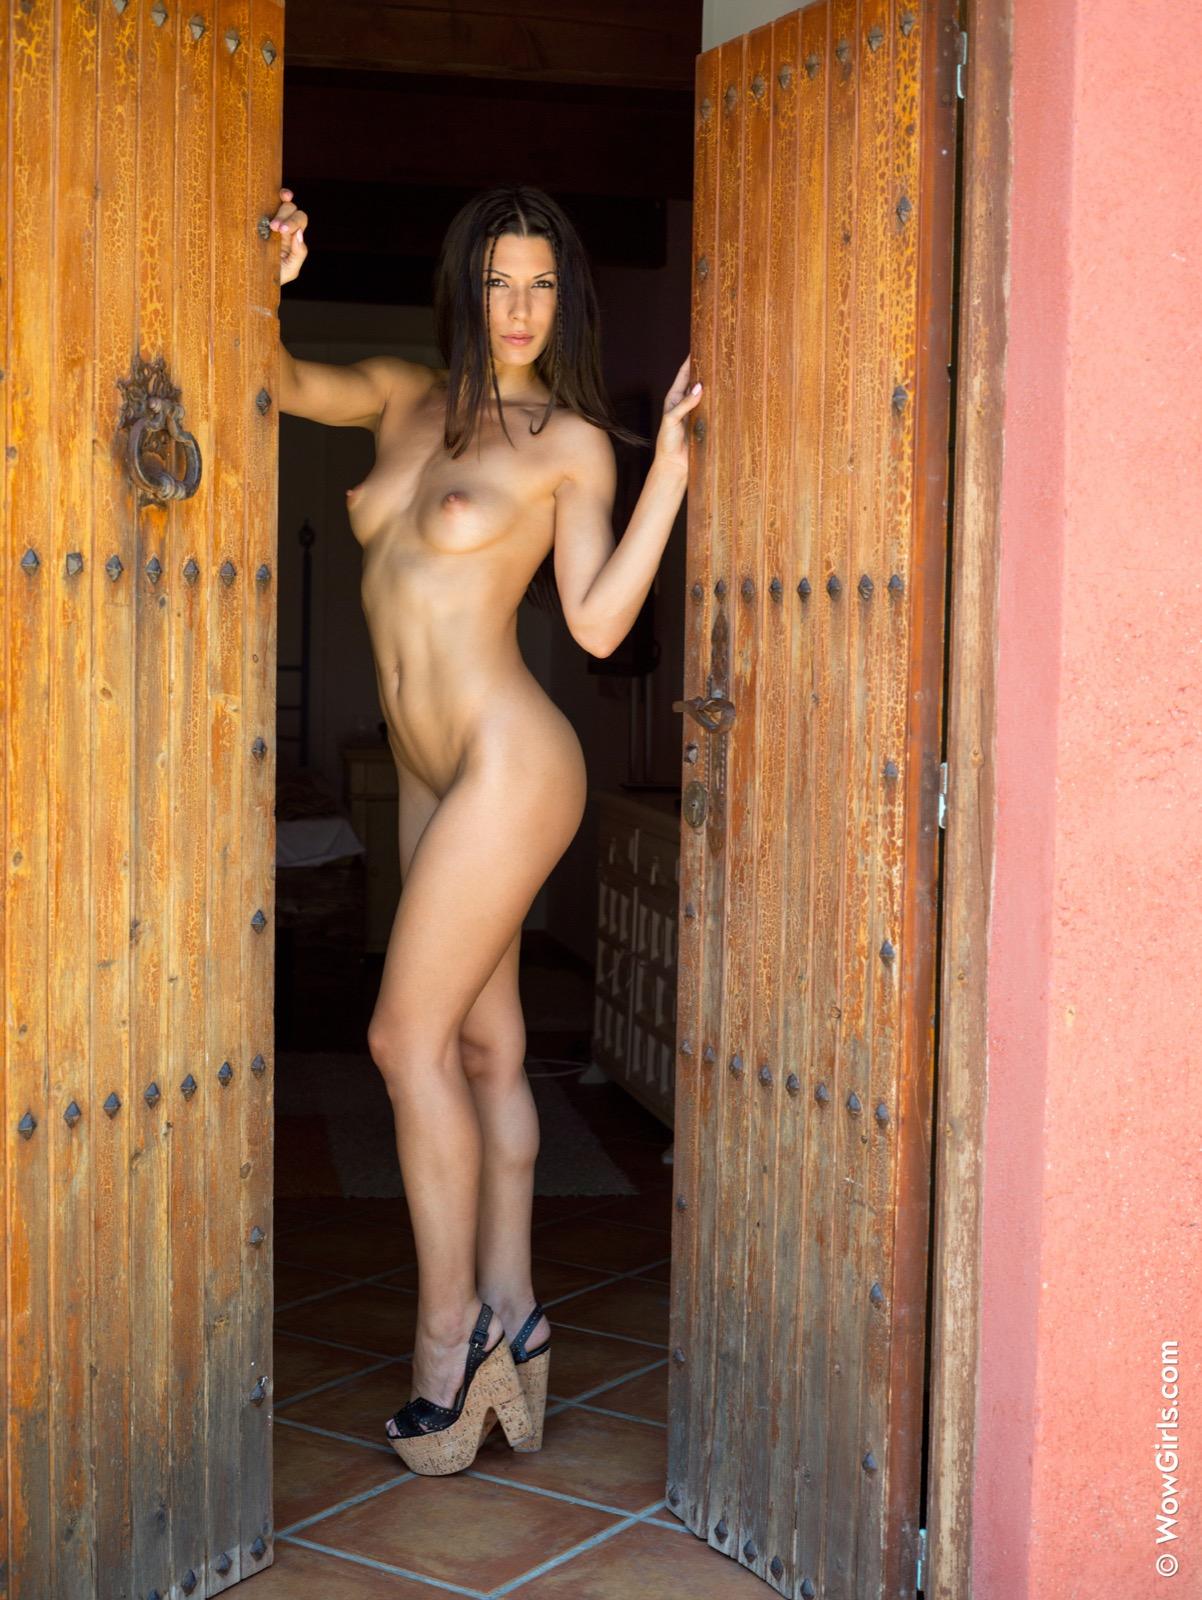 alexa_tomas_28849_5.jpg